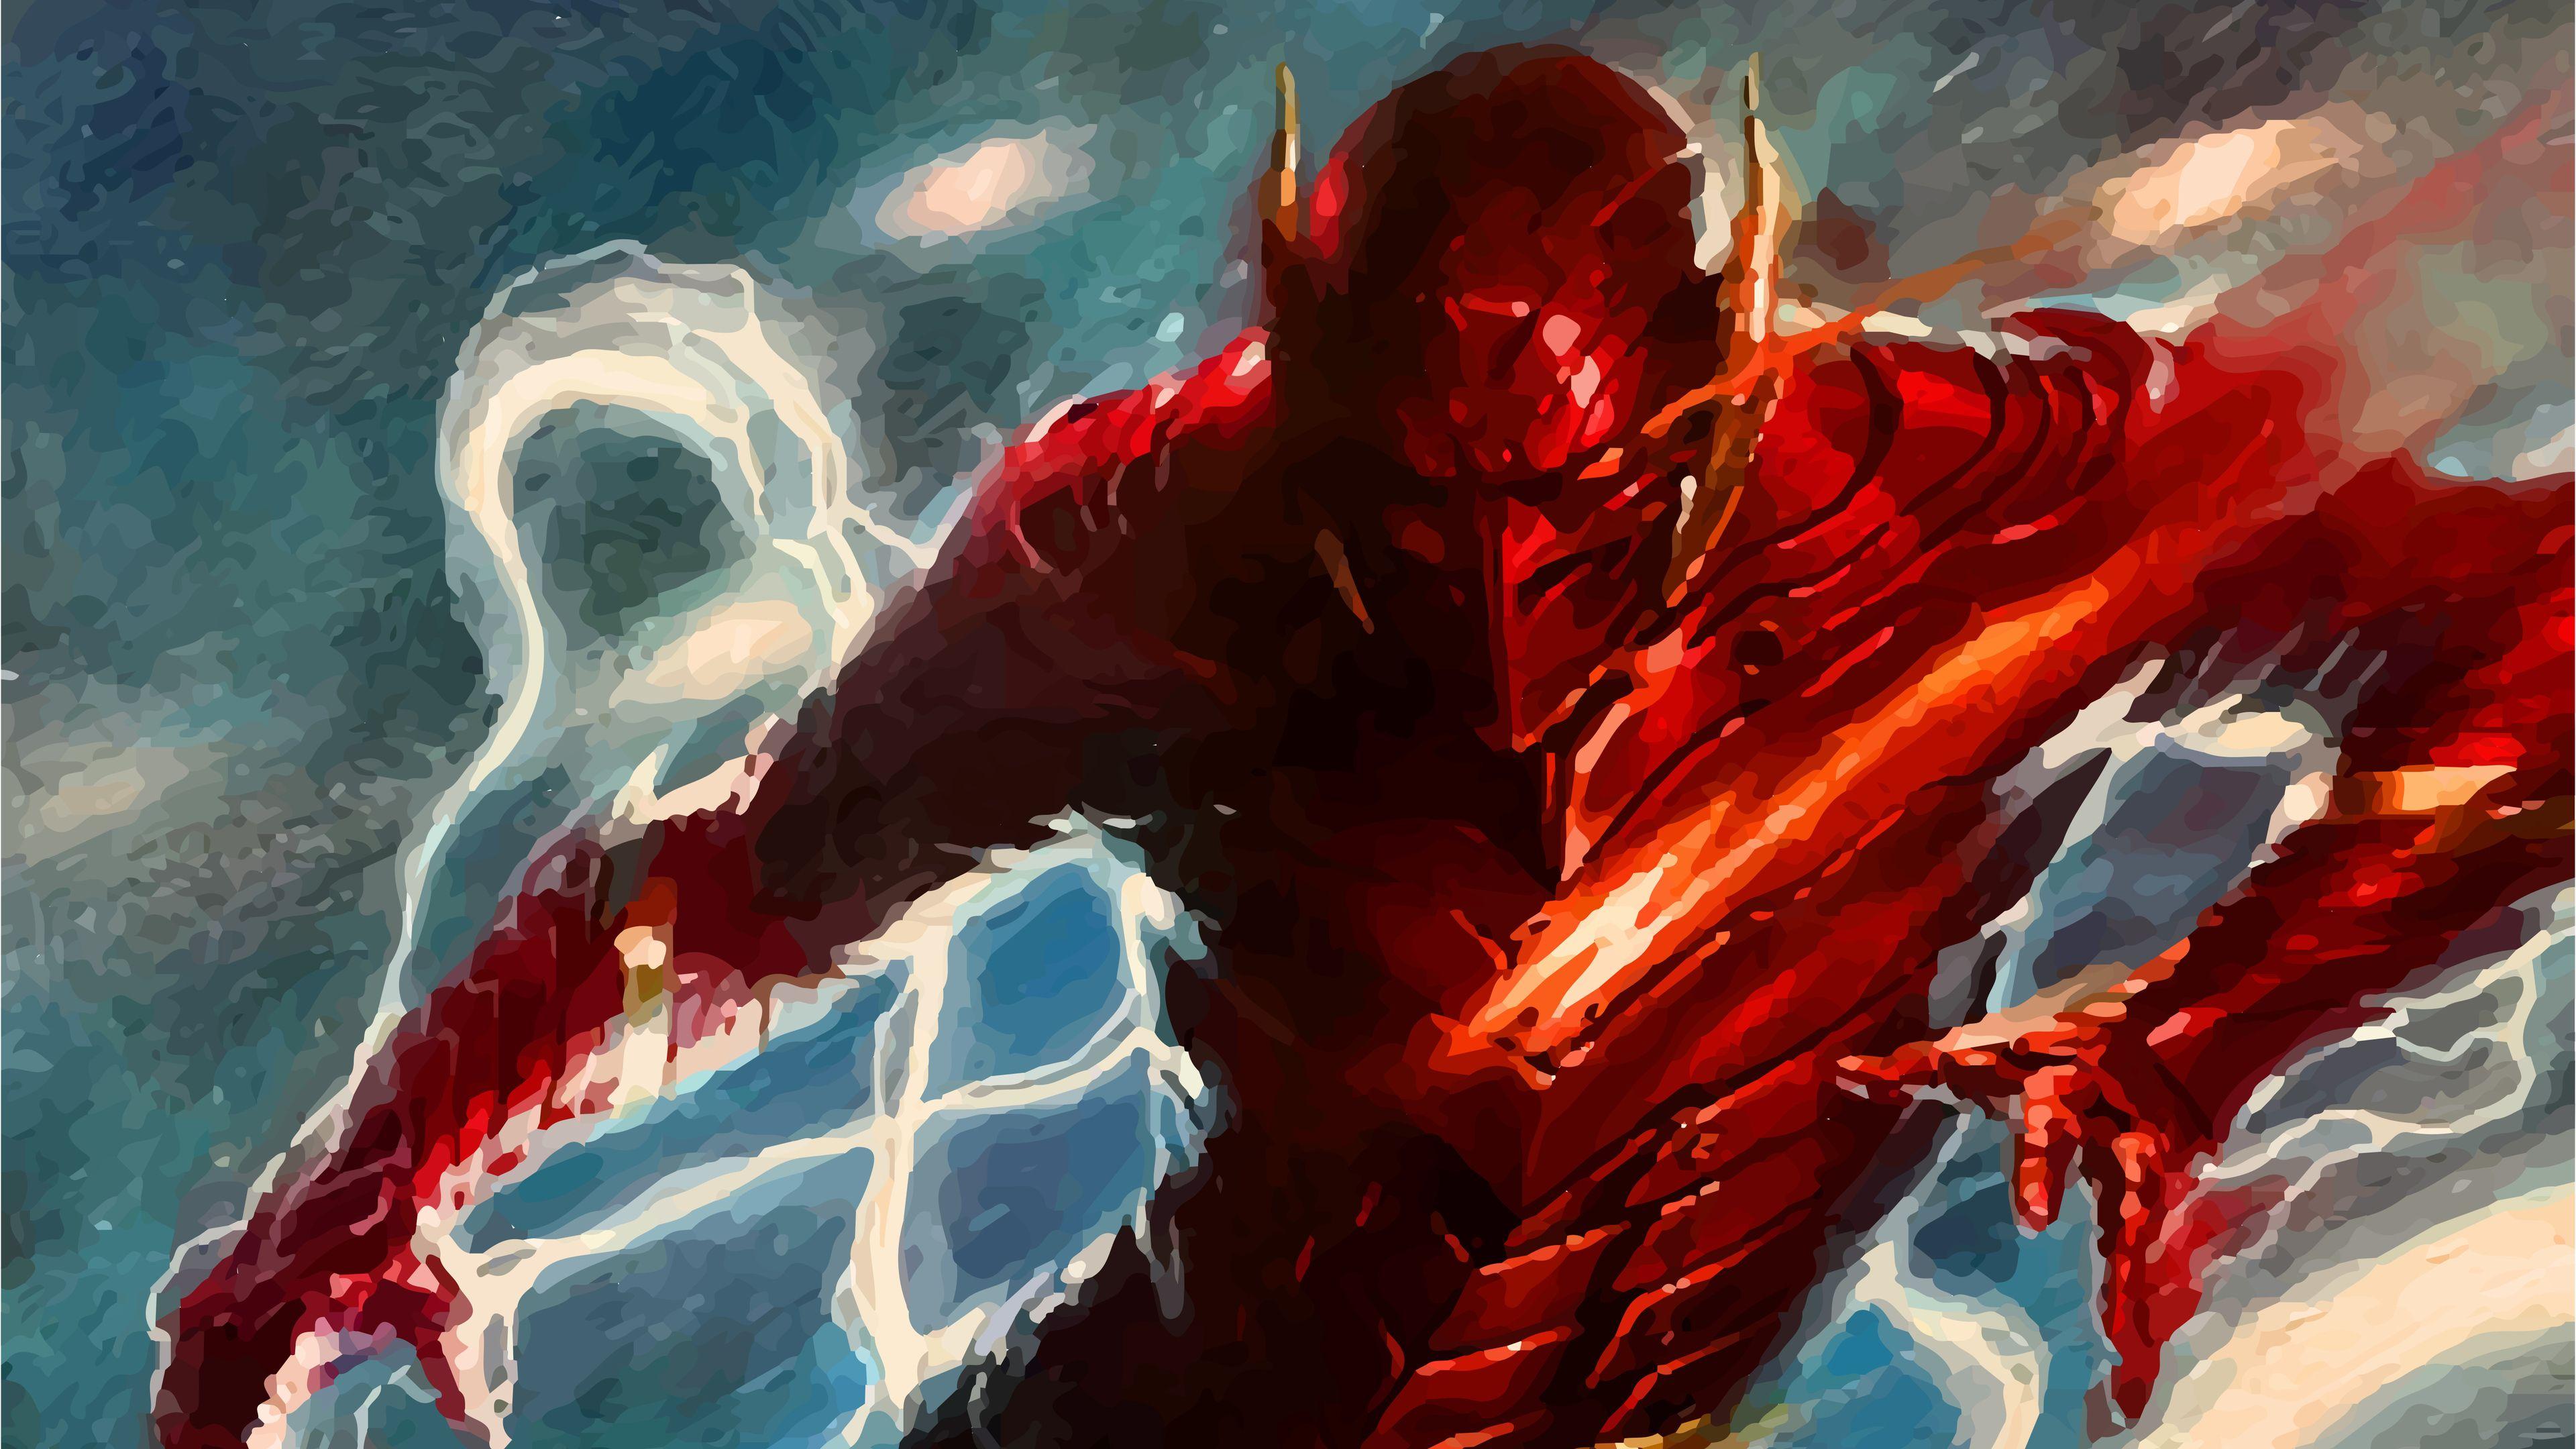 Flash Amazing Art 4k The Wallpapers Superheroes Flash